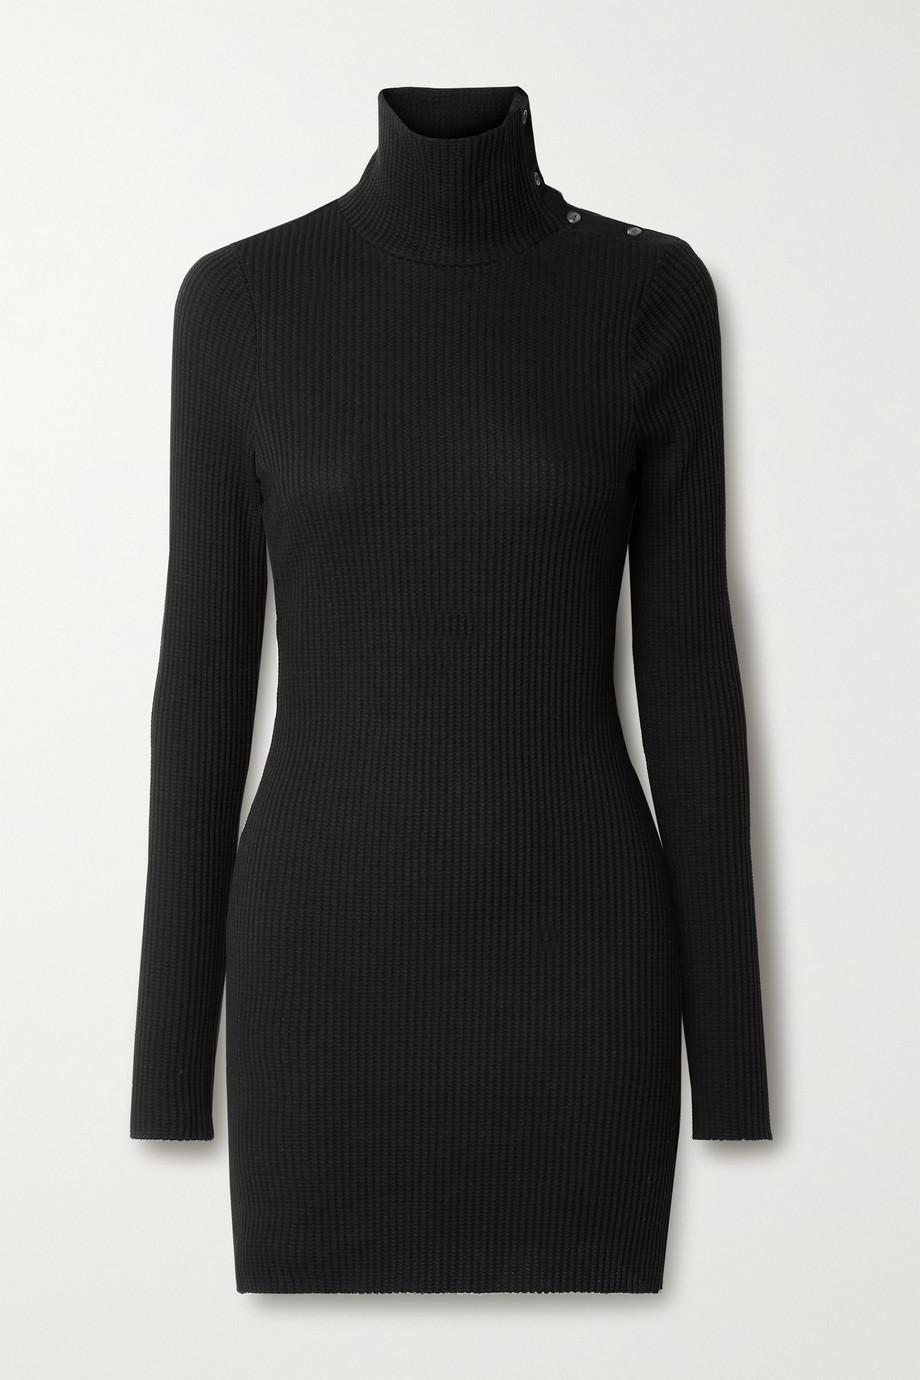 The Range Stark button-detailed waffle-knit cotton-blend turtleneck mini dress